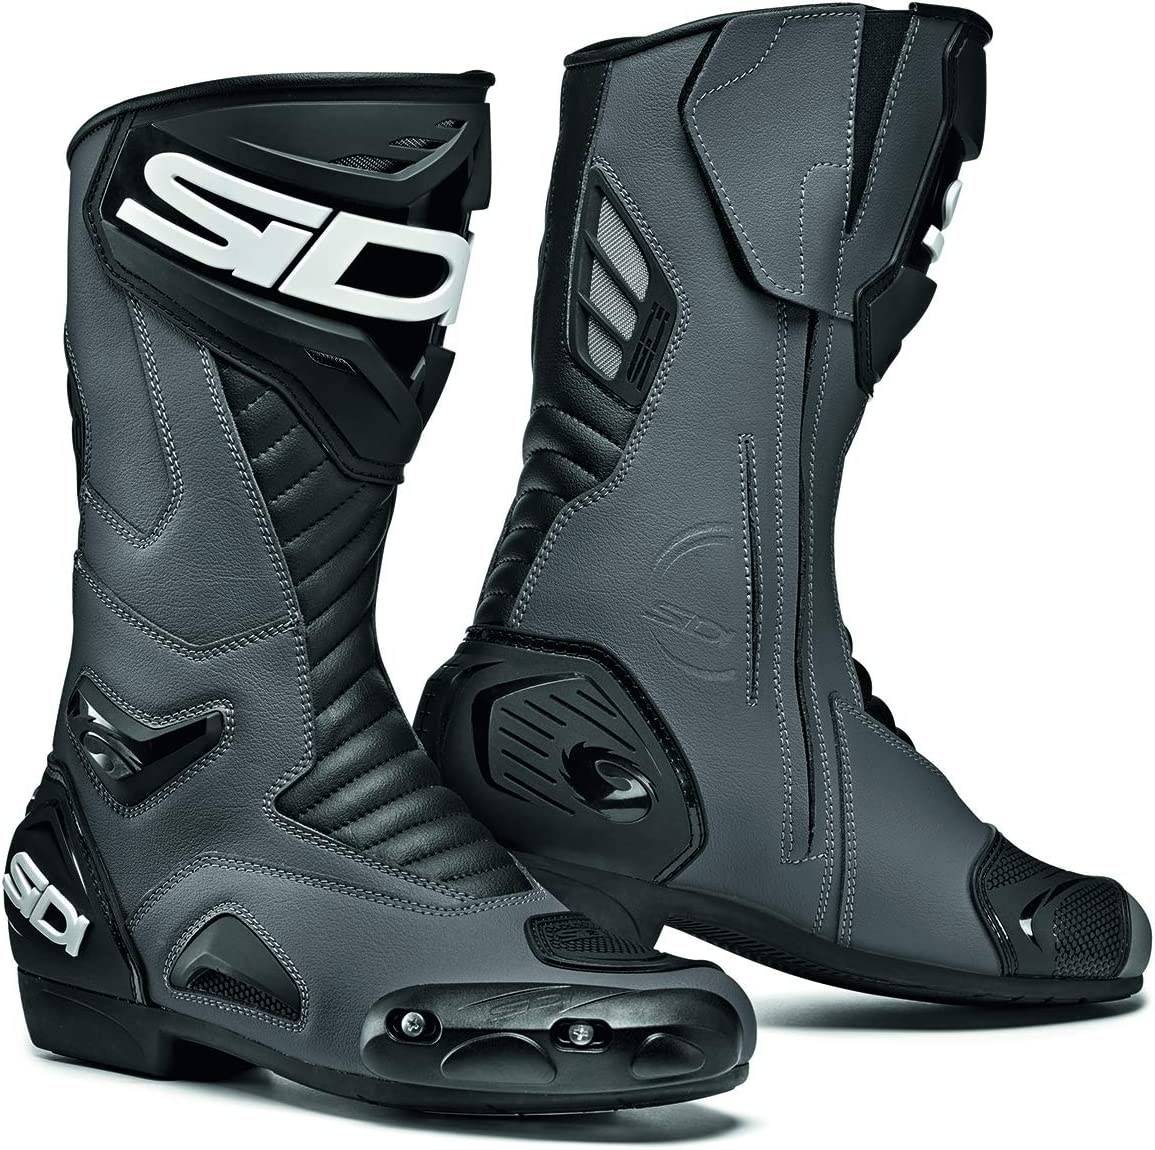 Sidi Performer Motorcycle Boots 45 Black UK 10.5